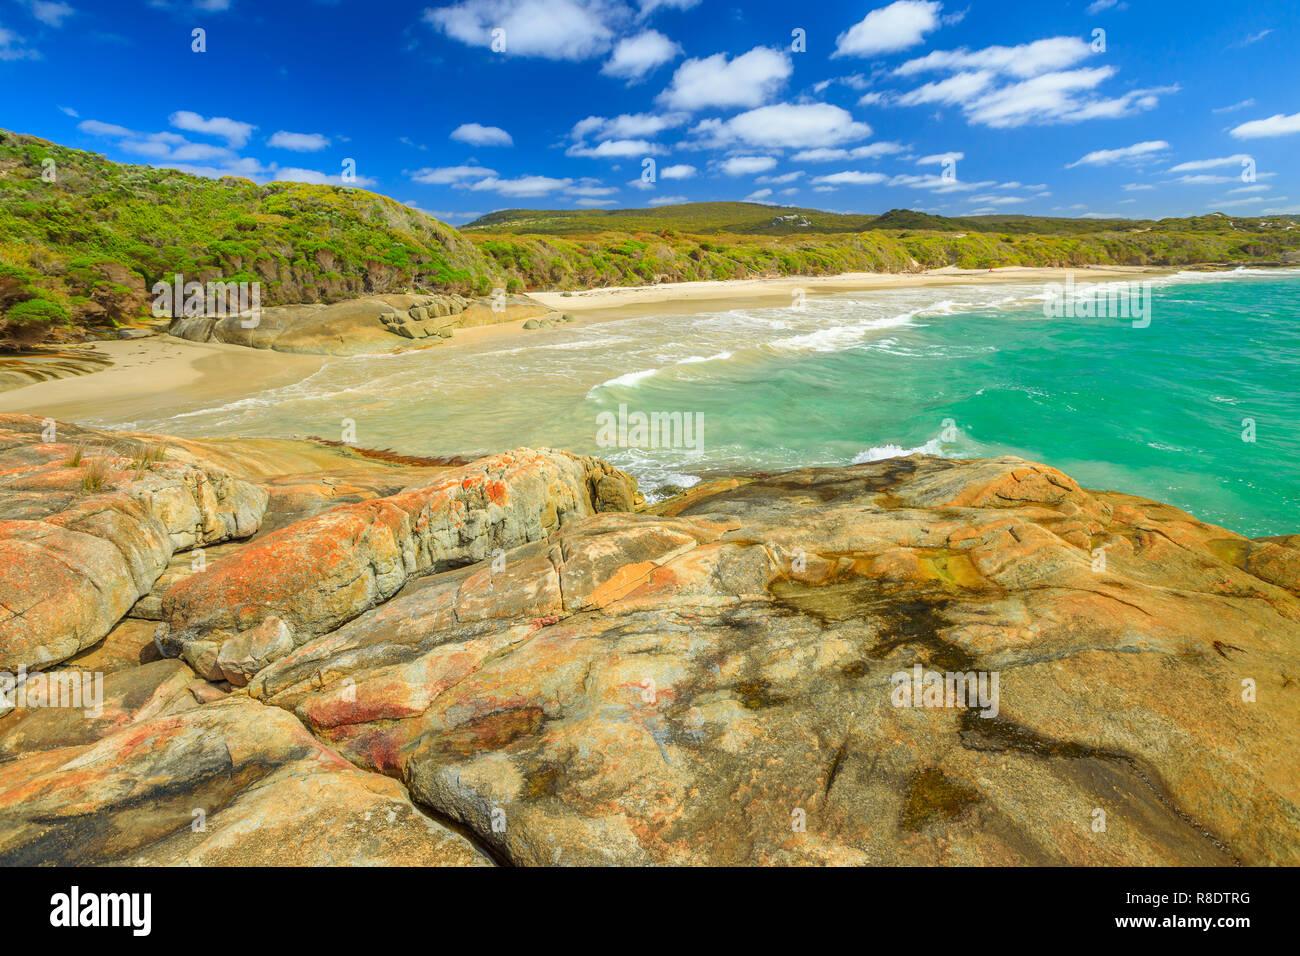 Australian travel summer destination. Waterfall Beach in Denmark region, Western Australia. Great Southern Ocean coastline in William Bay National Park. Sunny day, blue sky. Stock Photo